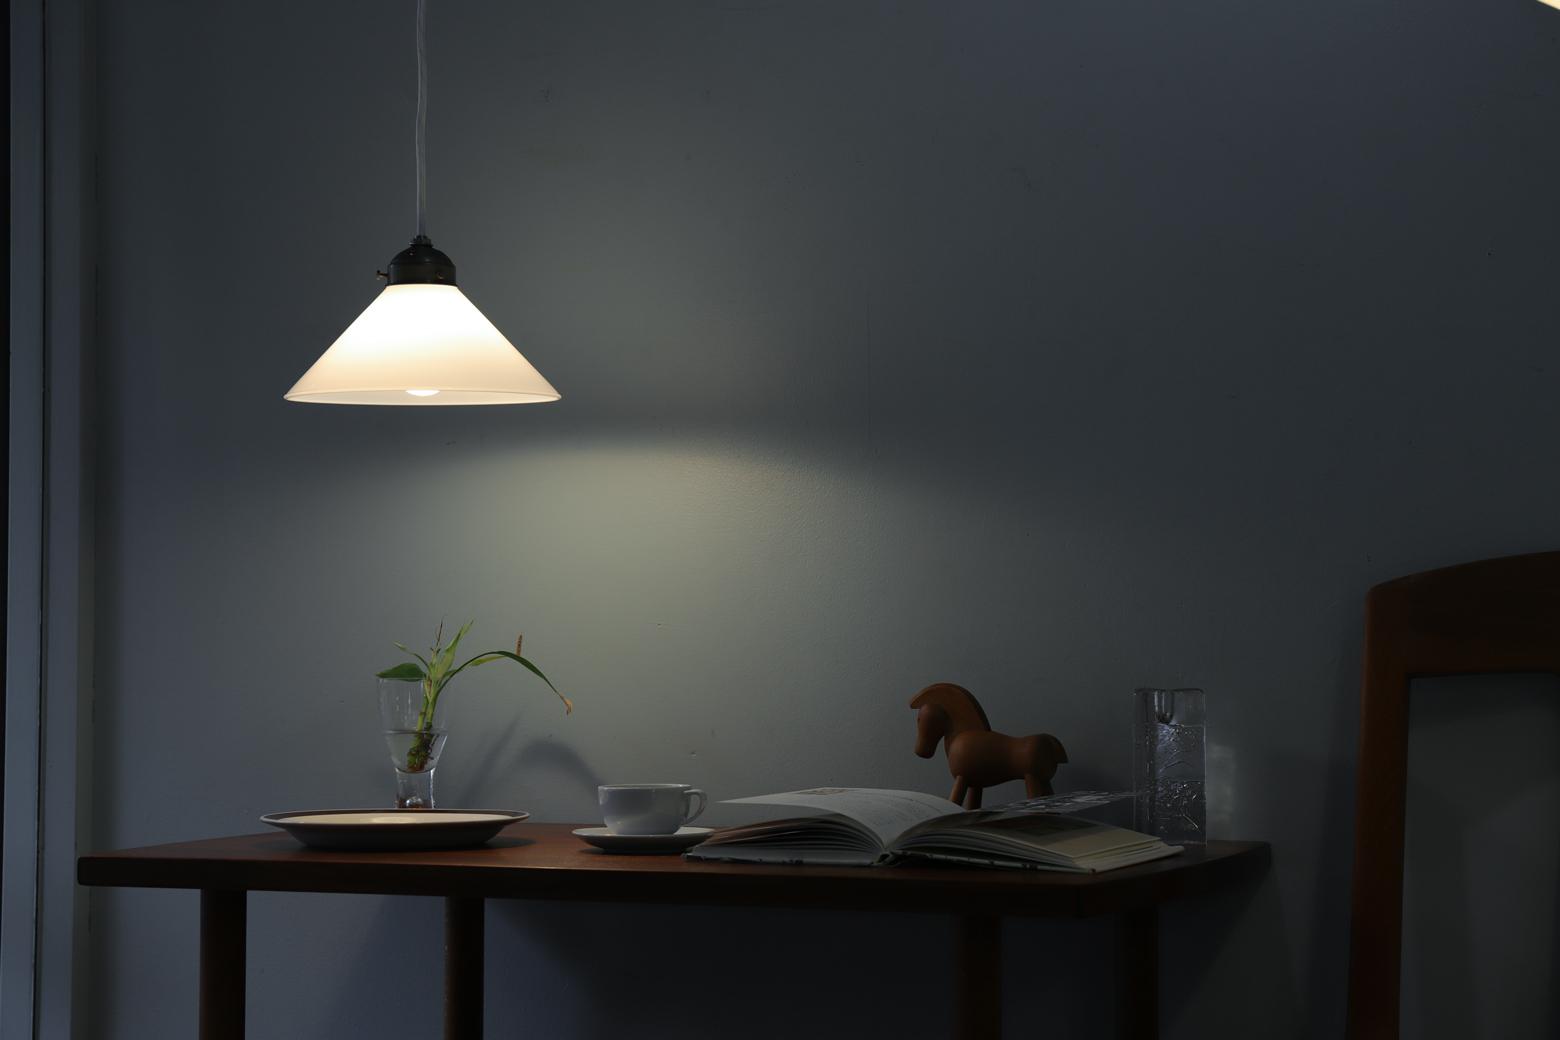 Antique Style Milk Glass Shade Pendant Light/ミルクガラス ペンダントライト レトロ 照明